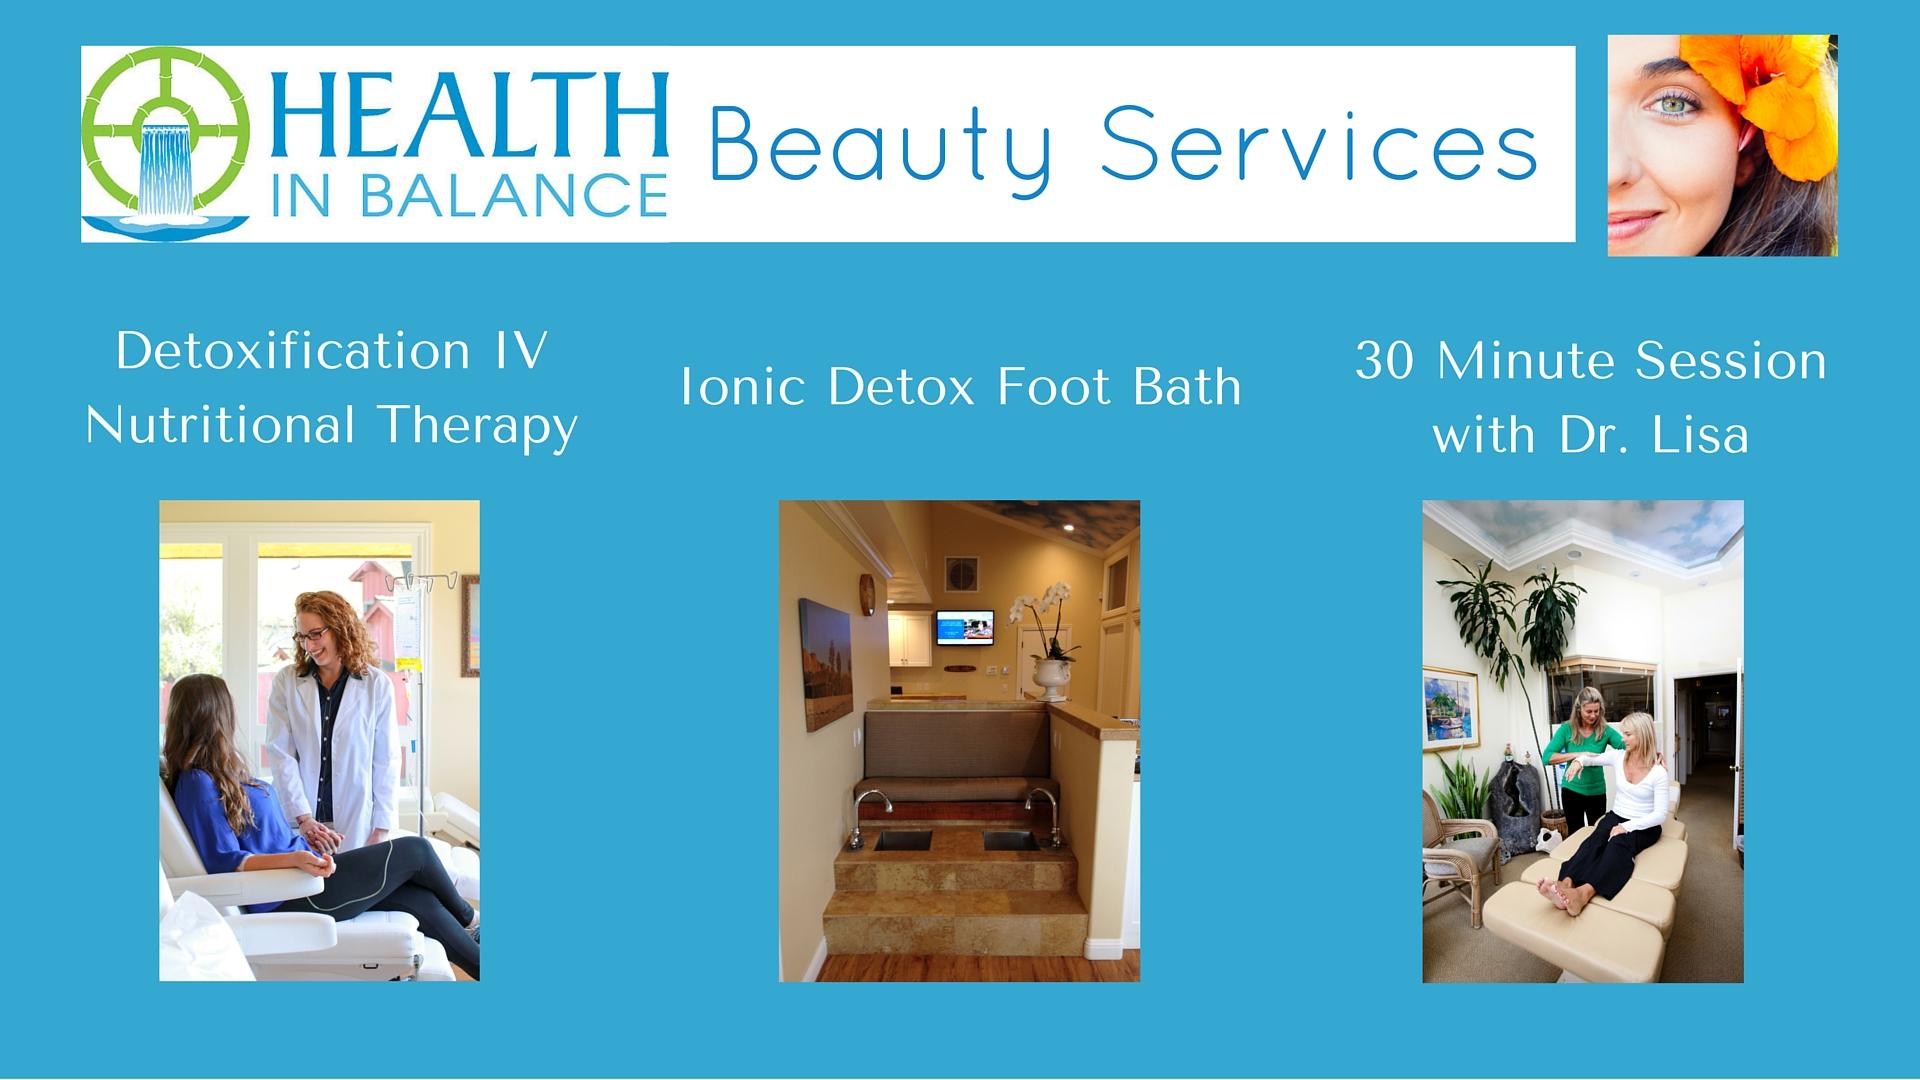 14 HIB Beauty Services.jpg